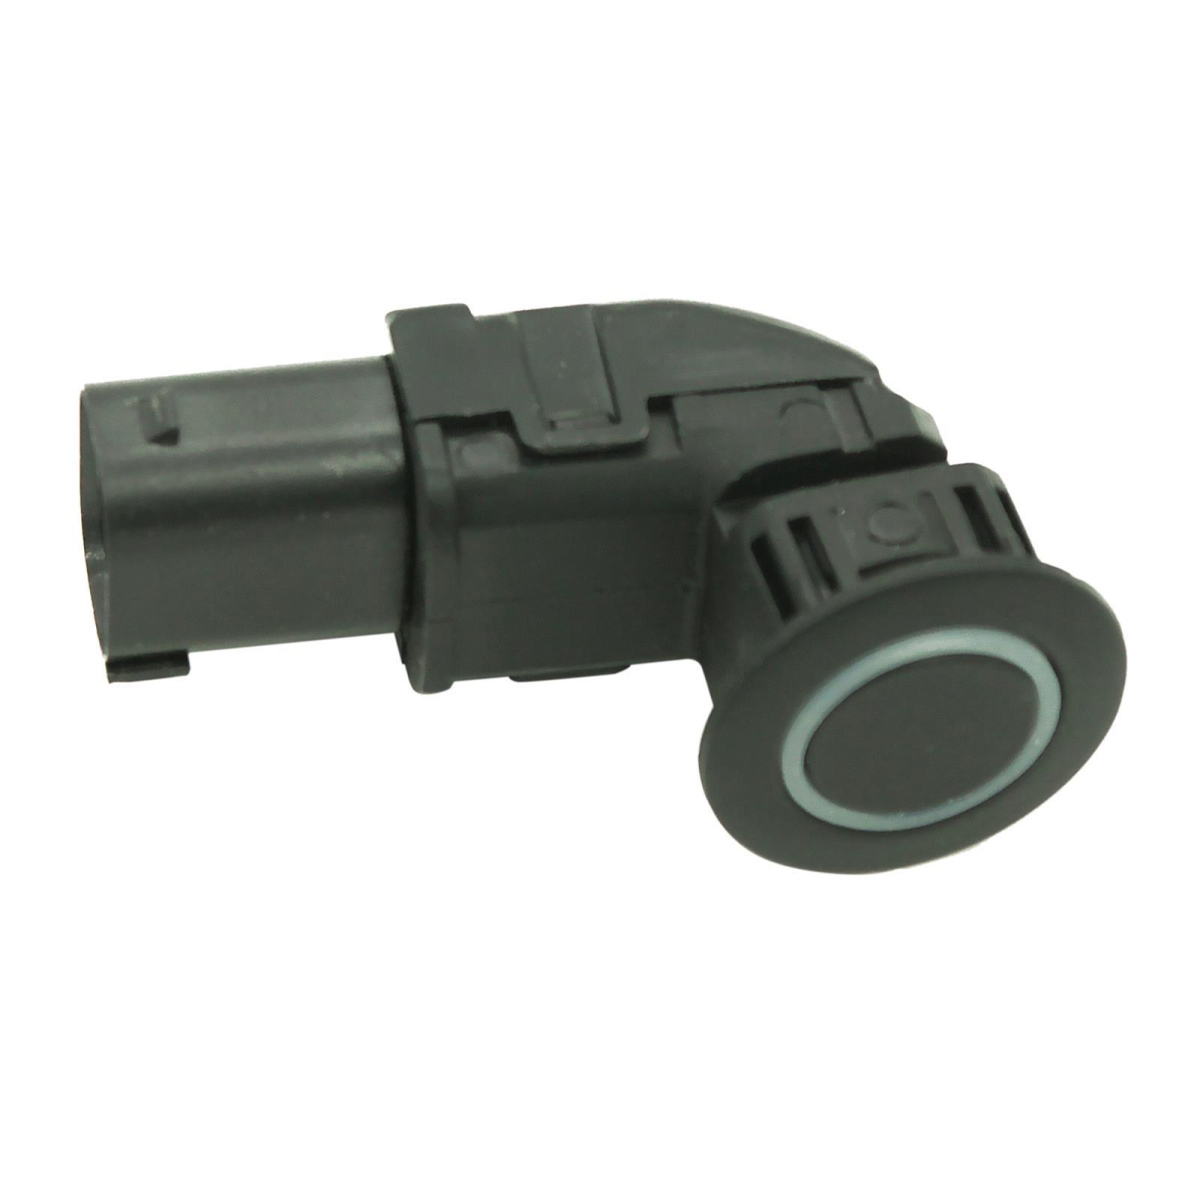 Park sensor 89341-28370 for Toyota PDC Parktronic